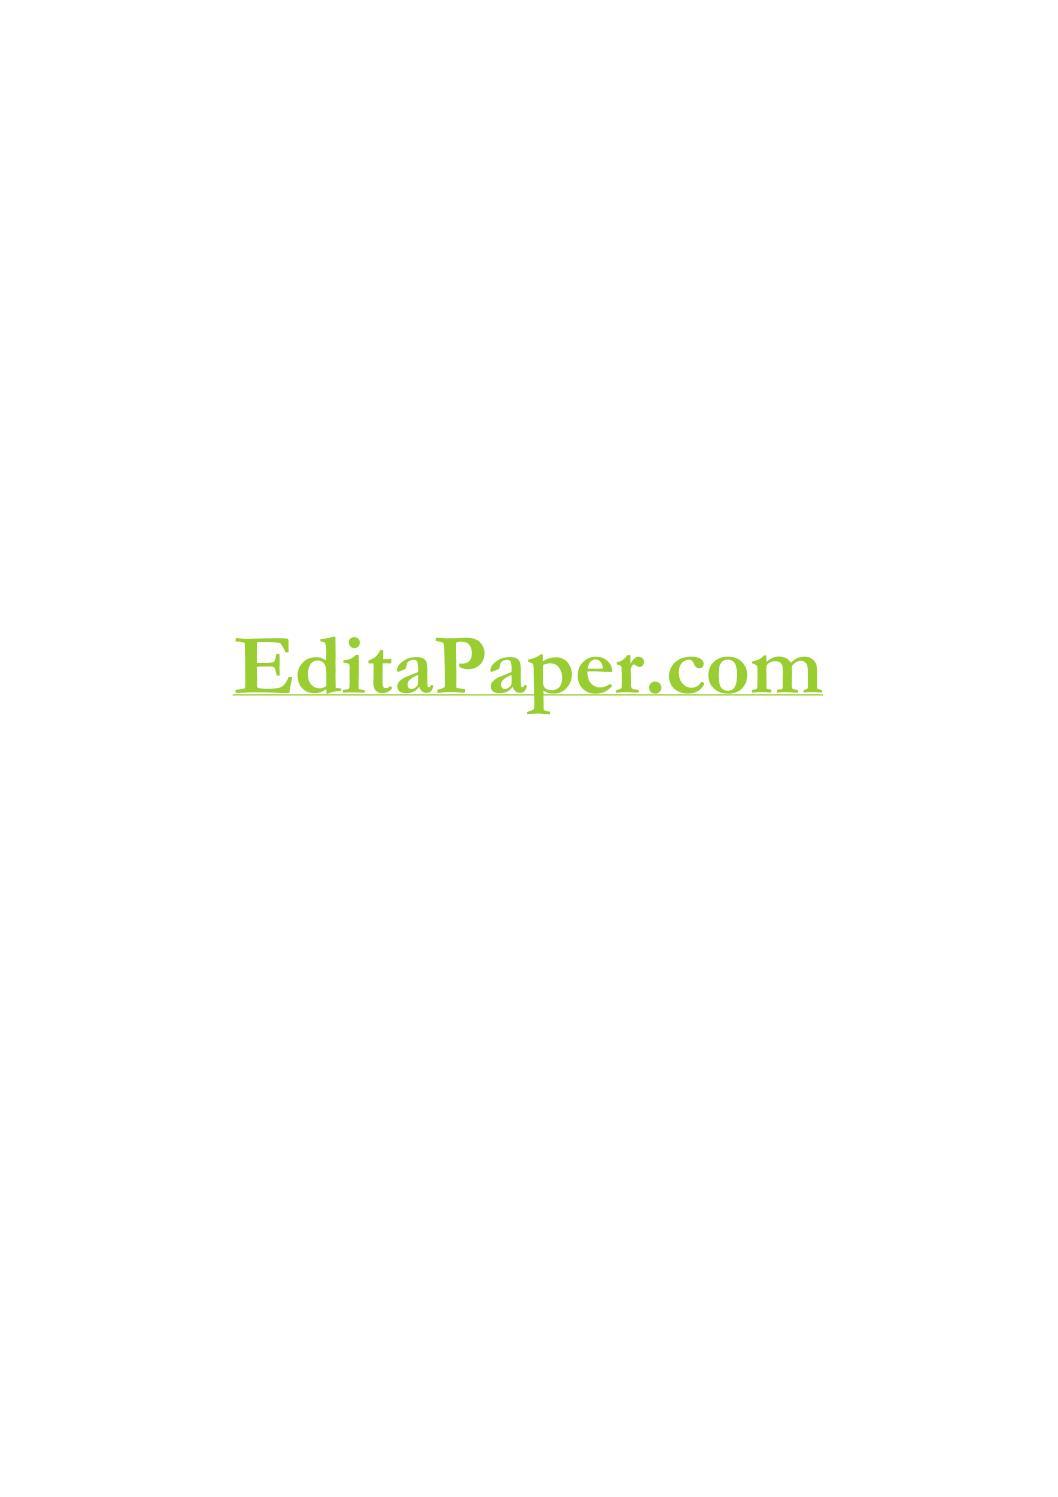 Essaytyper legitimate loans payment services number